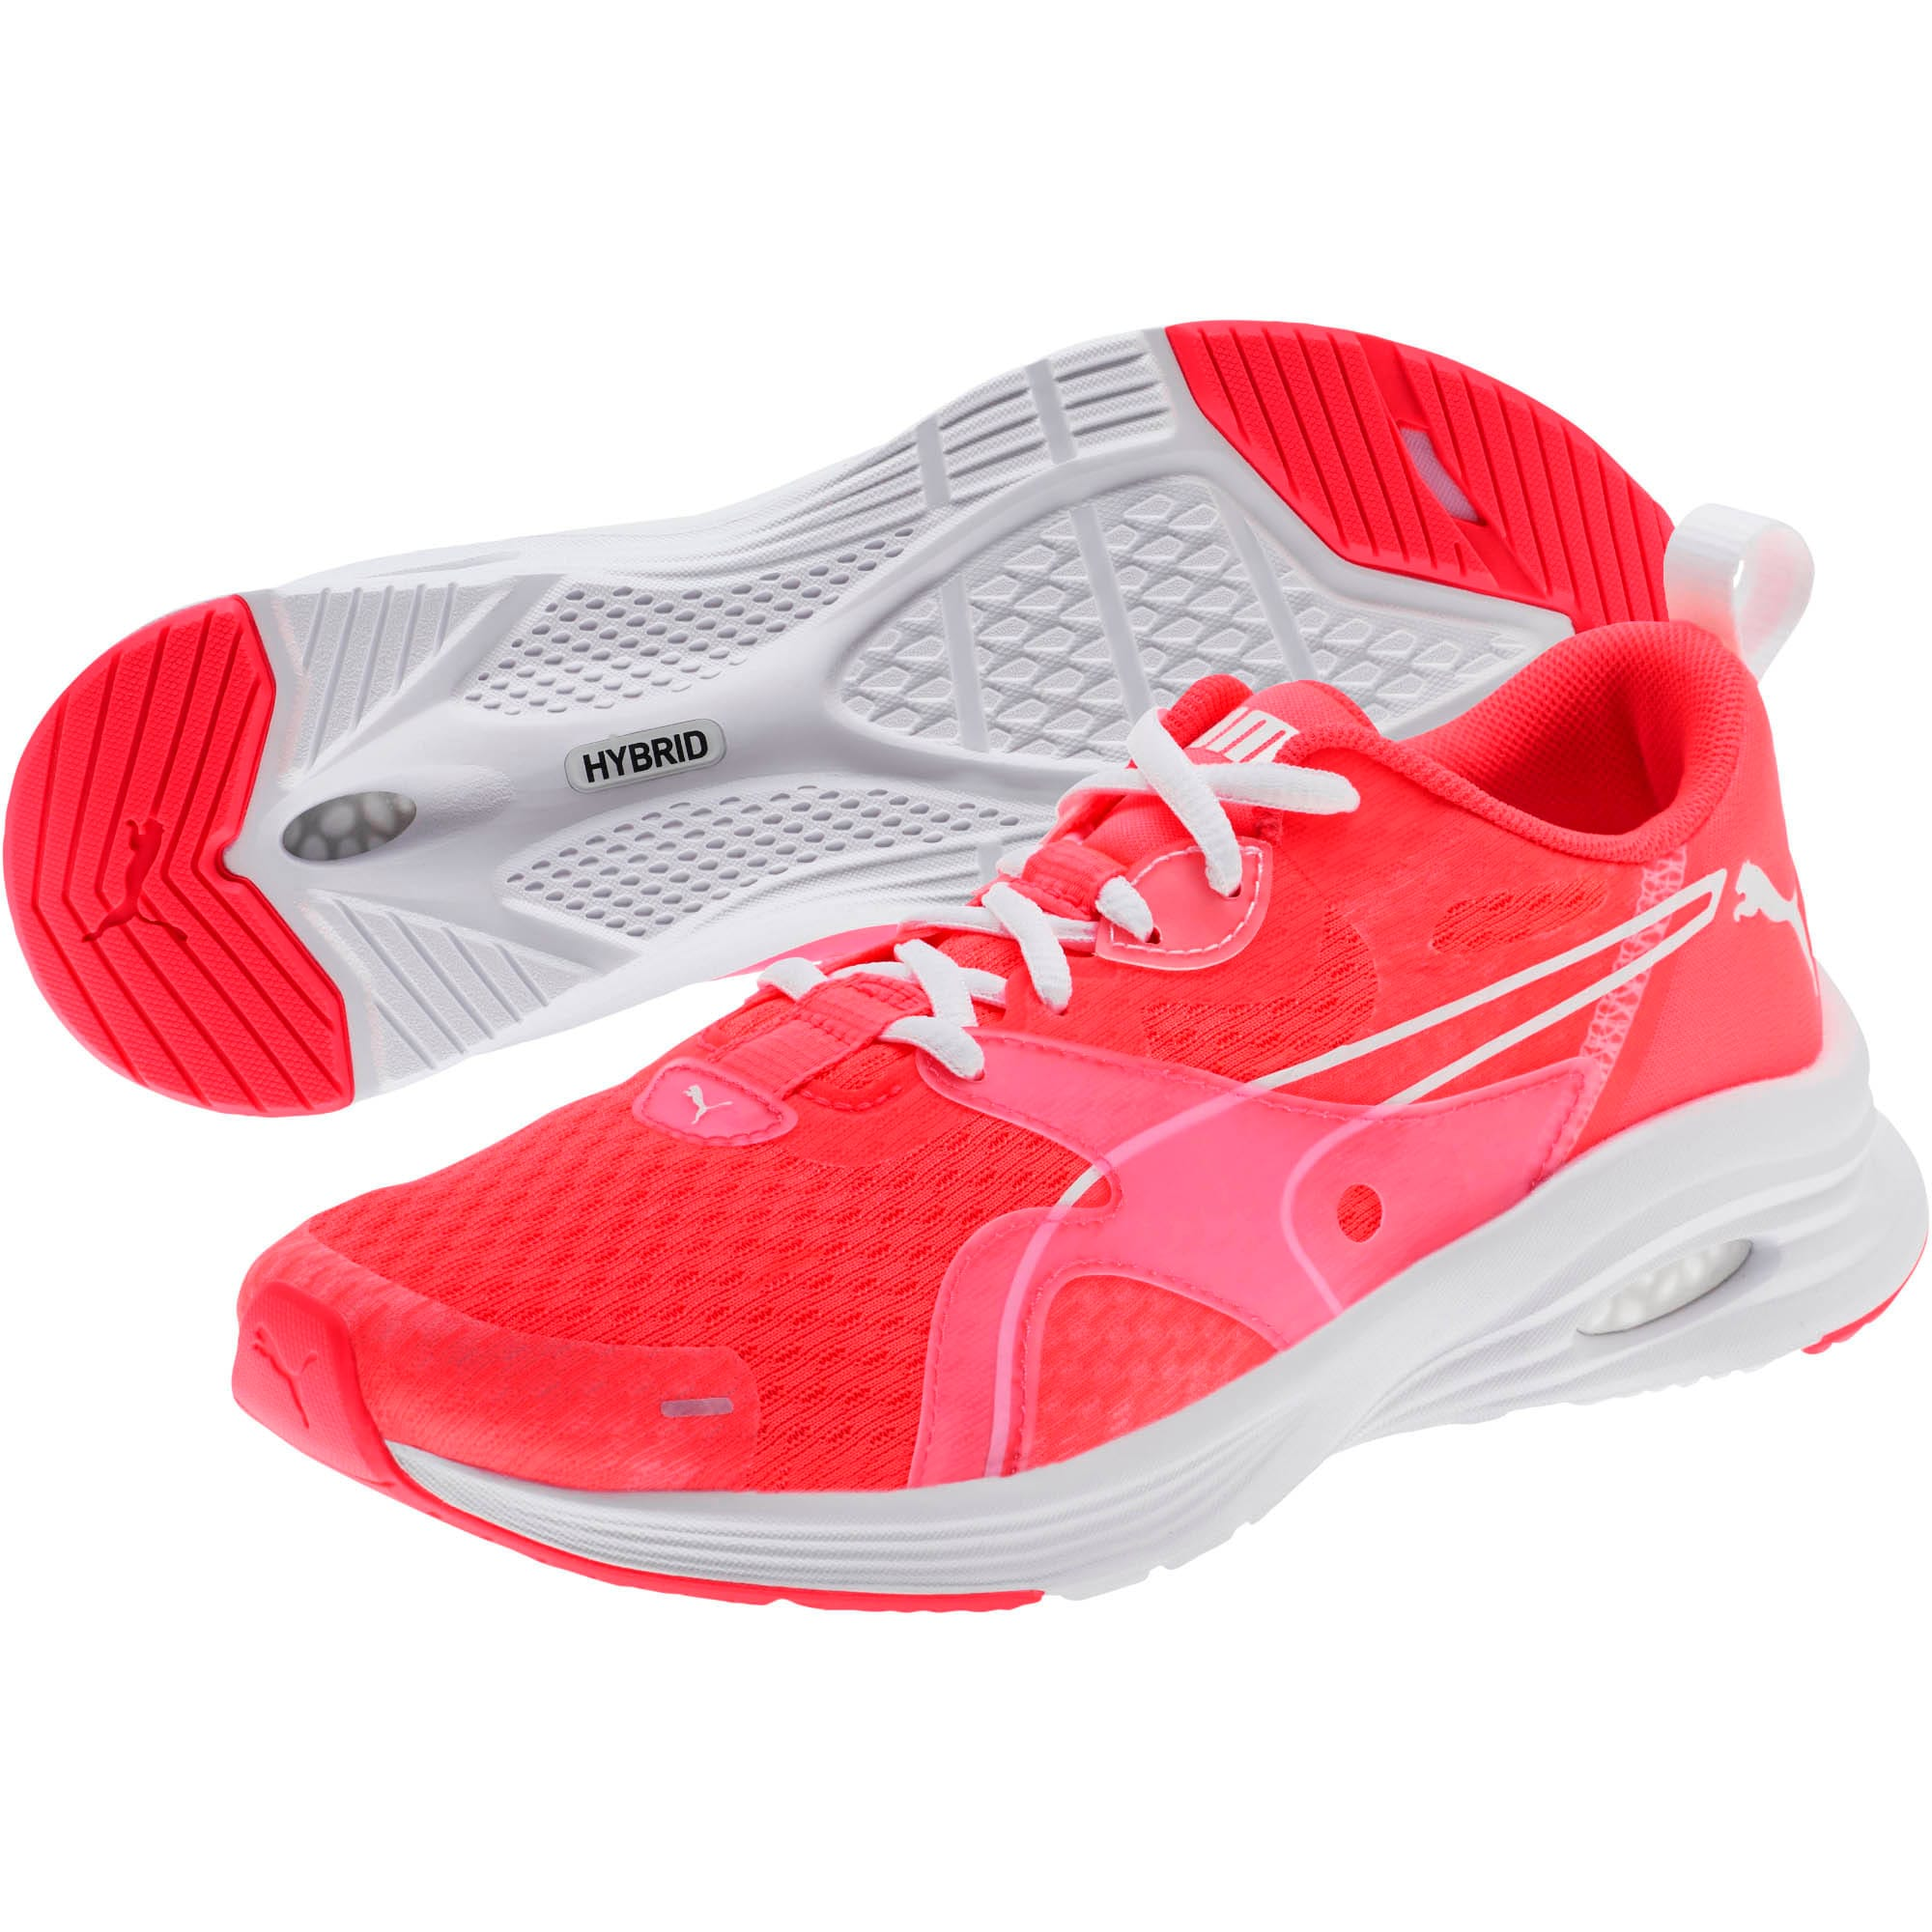 Thumbnail 2 of HYBRID Fuego Women's Running Shoes, Pink Alert-Puma White, medium